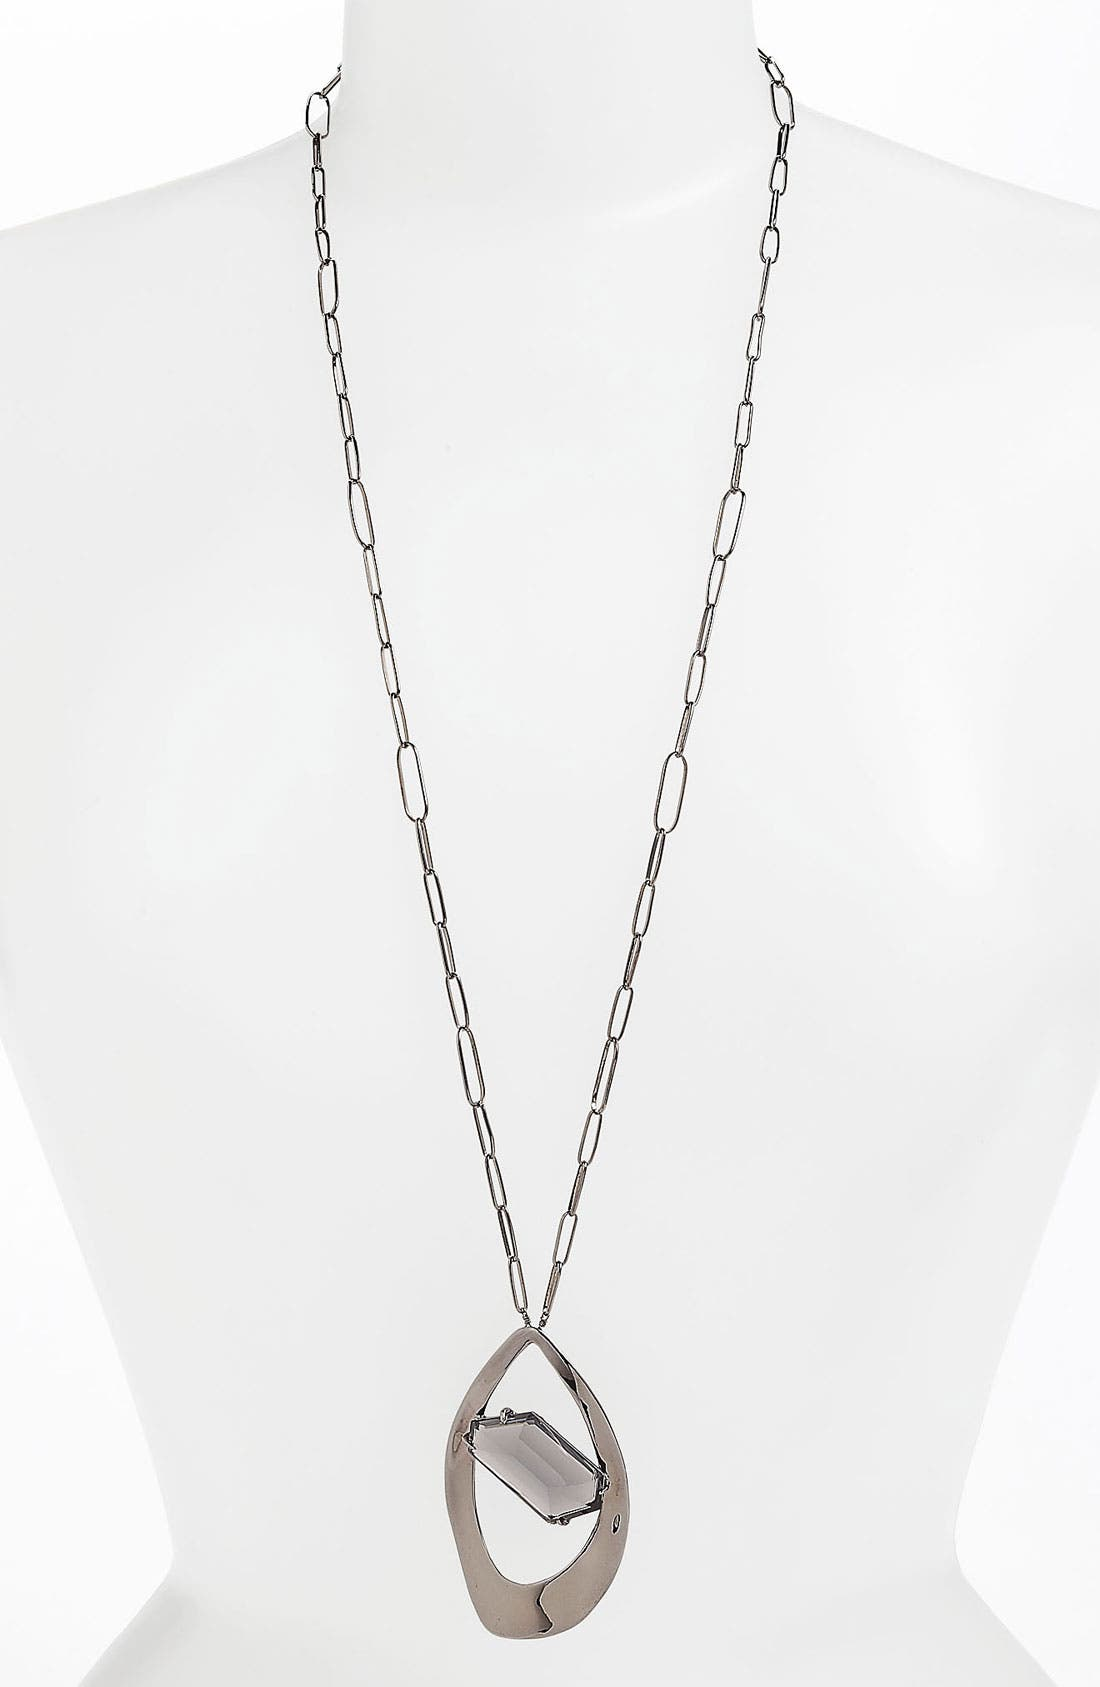 Alternate Image 1 Selected - Alexis Bittar 'Miss Havisham - Bel Air' Wavy Pendant Necklace (Nordstrom Exclusive)